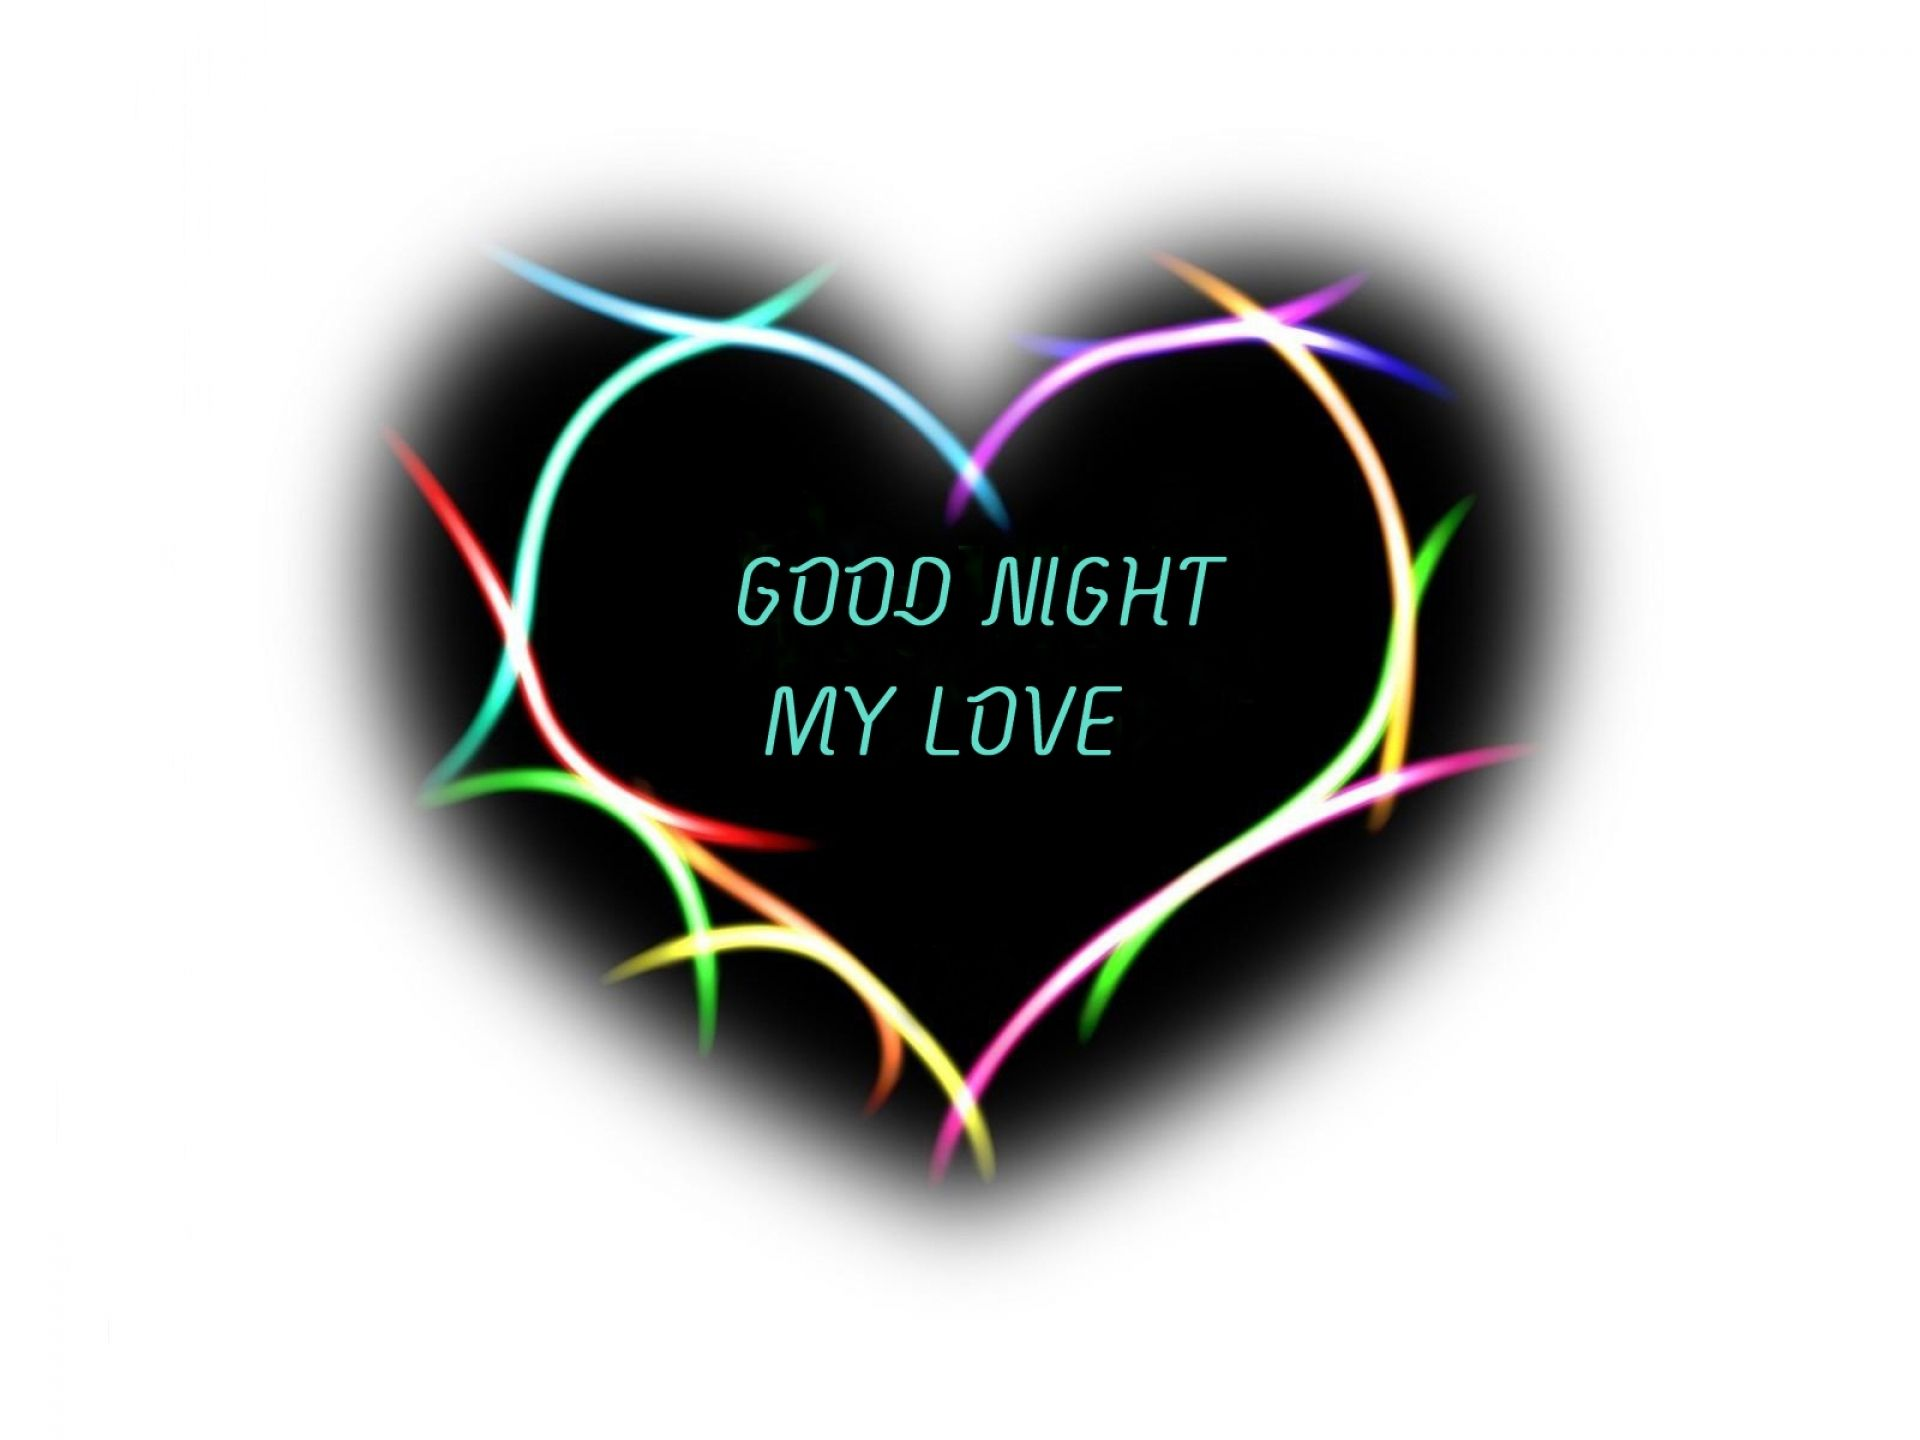 Hd wallpaper upload - Good Night Love Heart Images Live Wallpapers Hd Upload By Josip Stark